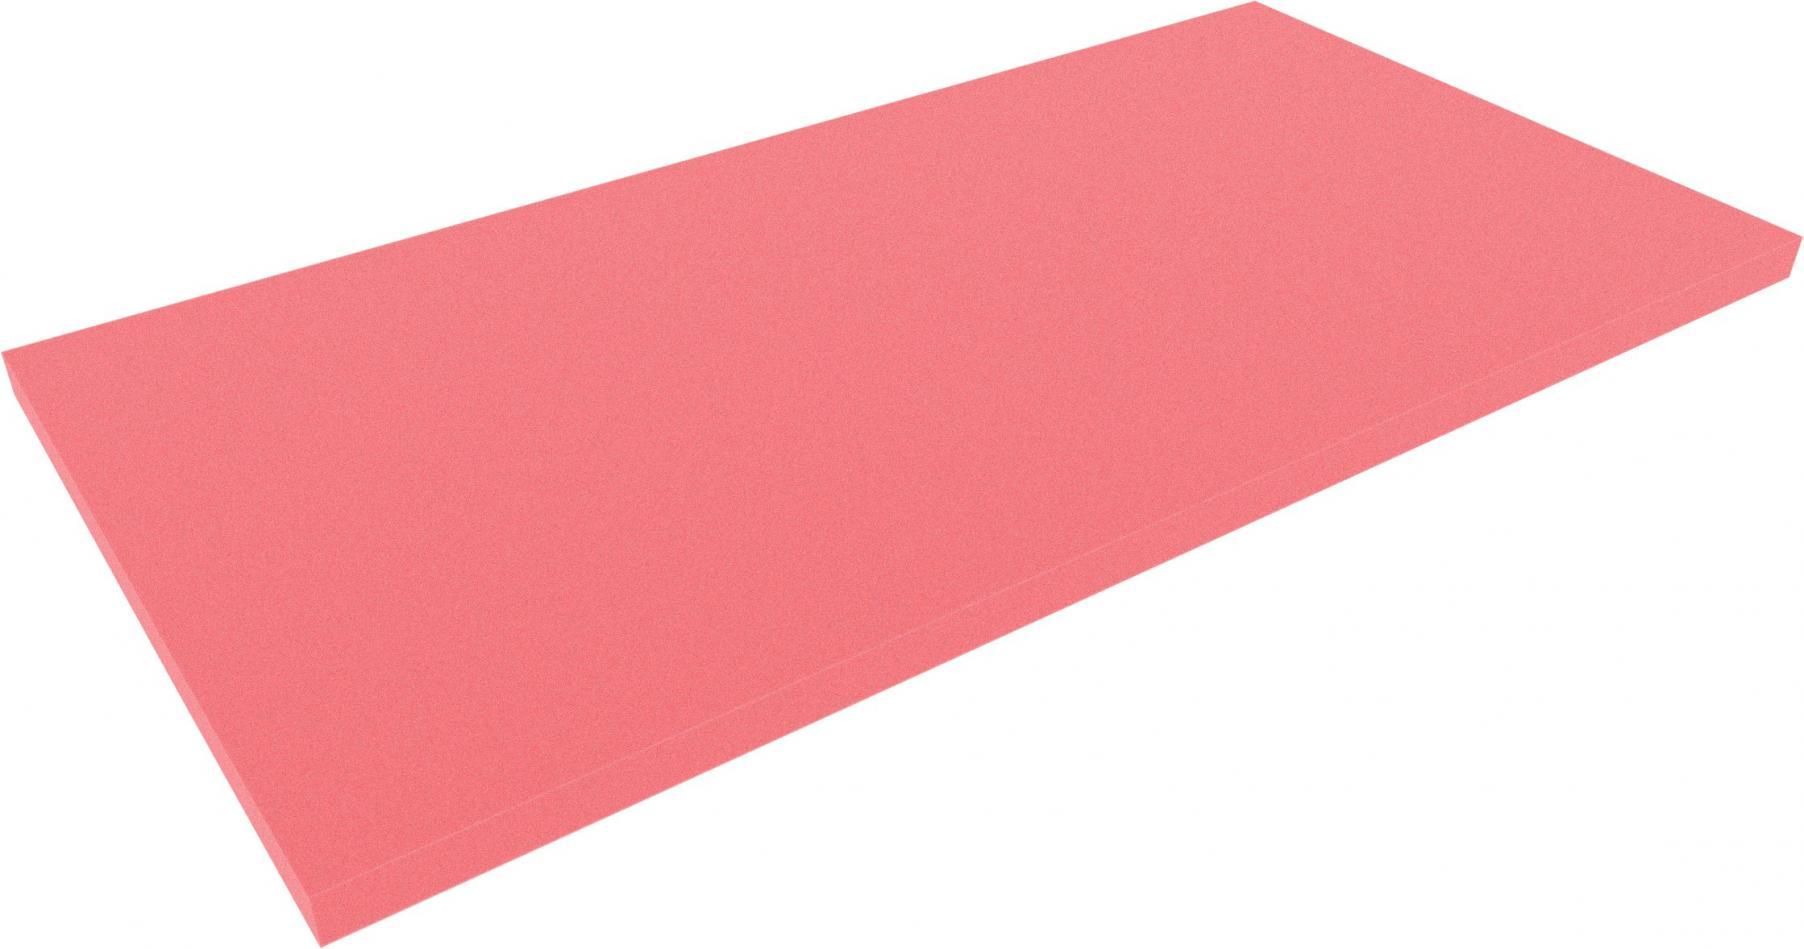 1000 mm x 500 mm x 30 mm foam sheet / cutting, red